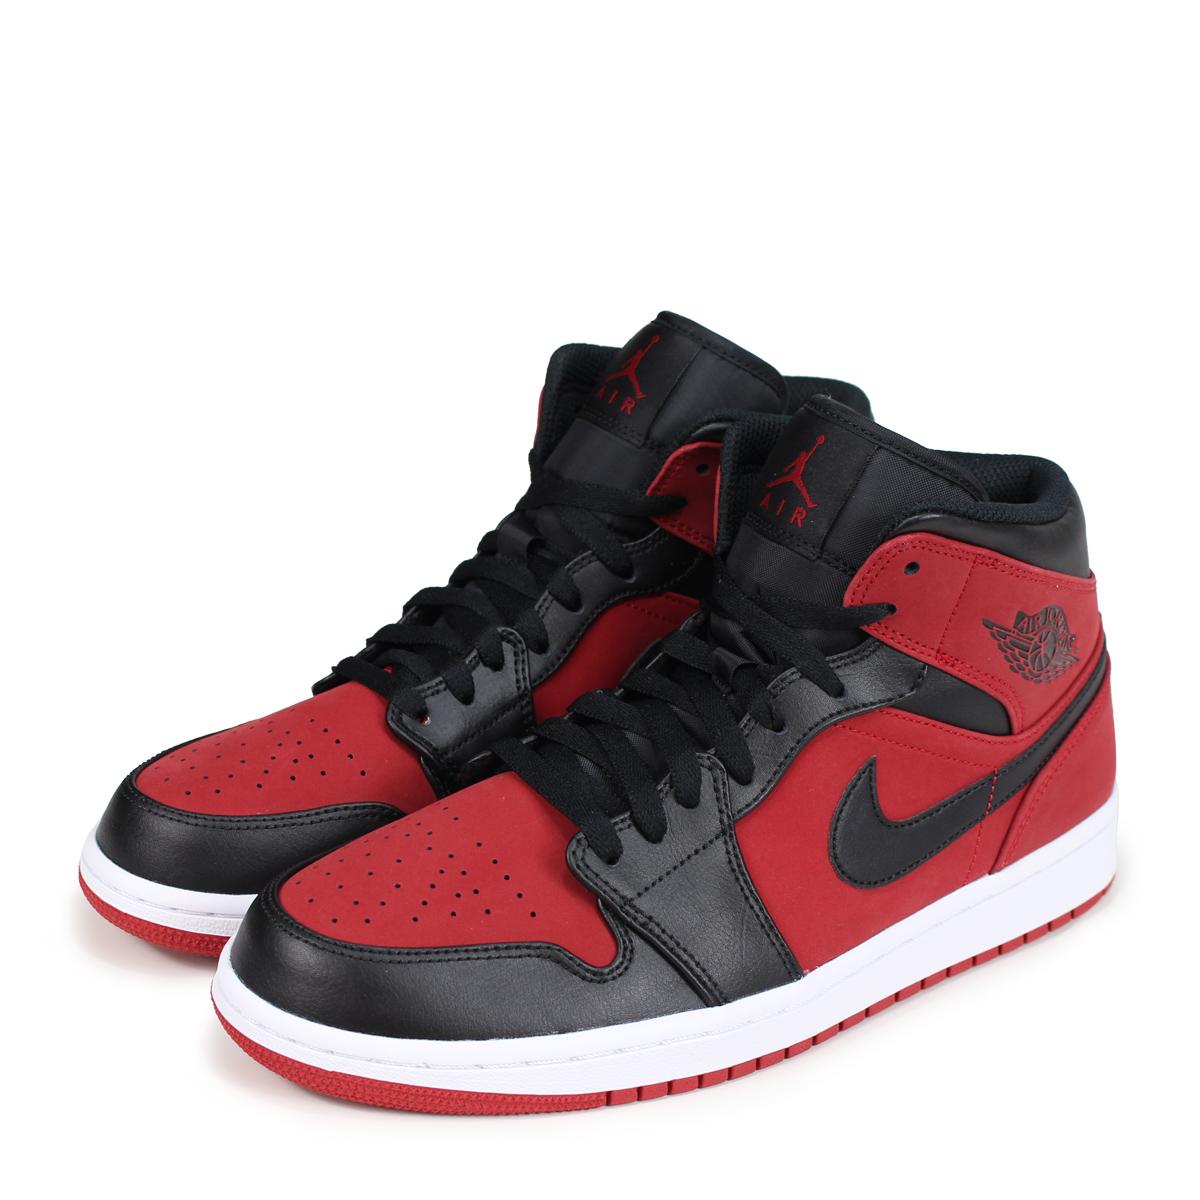 NIKE JORDAN product Jordan redload Shinnyu in men containing187 1 610 554 reservation MID planned load Nike AIR 83 Air 724 sneakers 1 SVpLUGzMjq